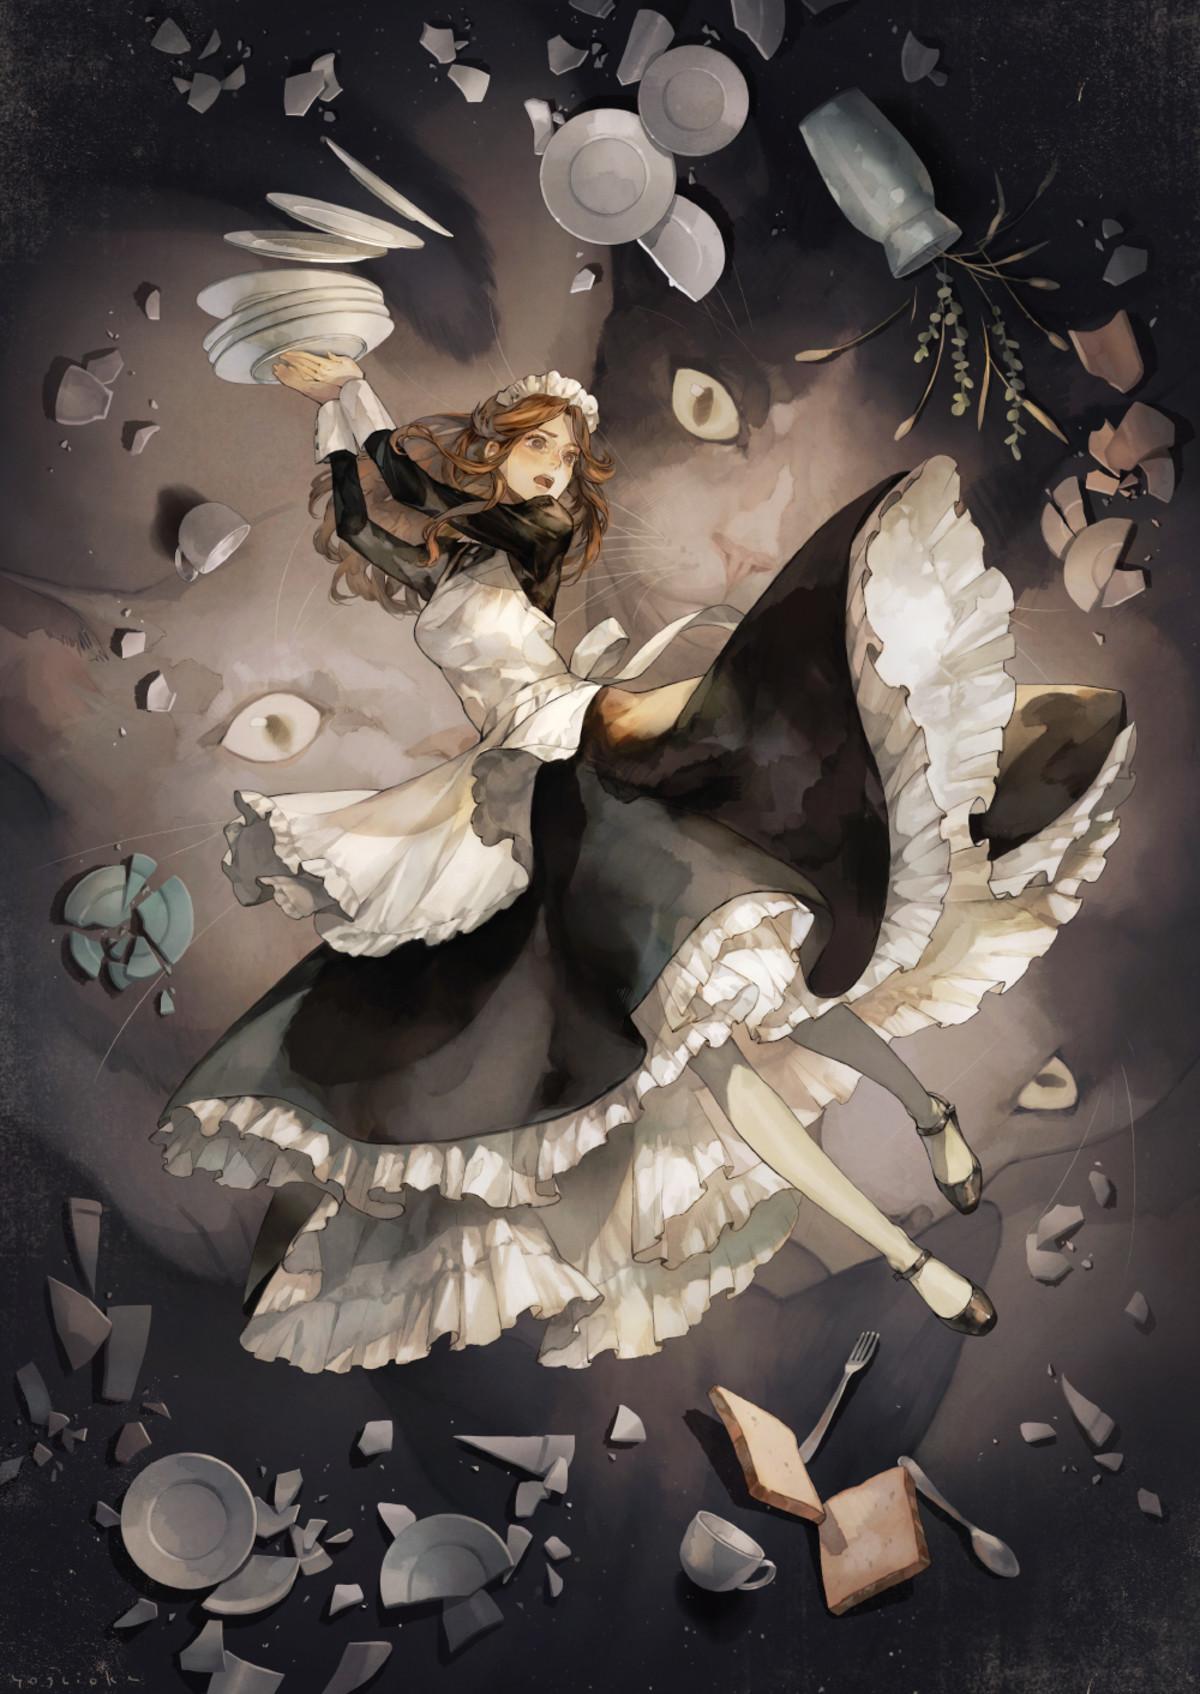 Maid March part 11. join list: SplendidServants (495 subs)Mention History join list:. helose canichaikait